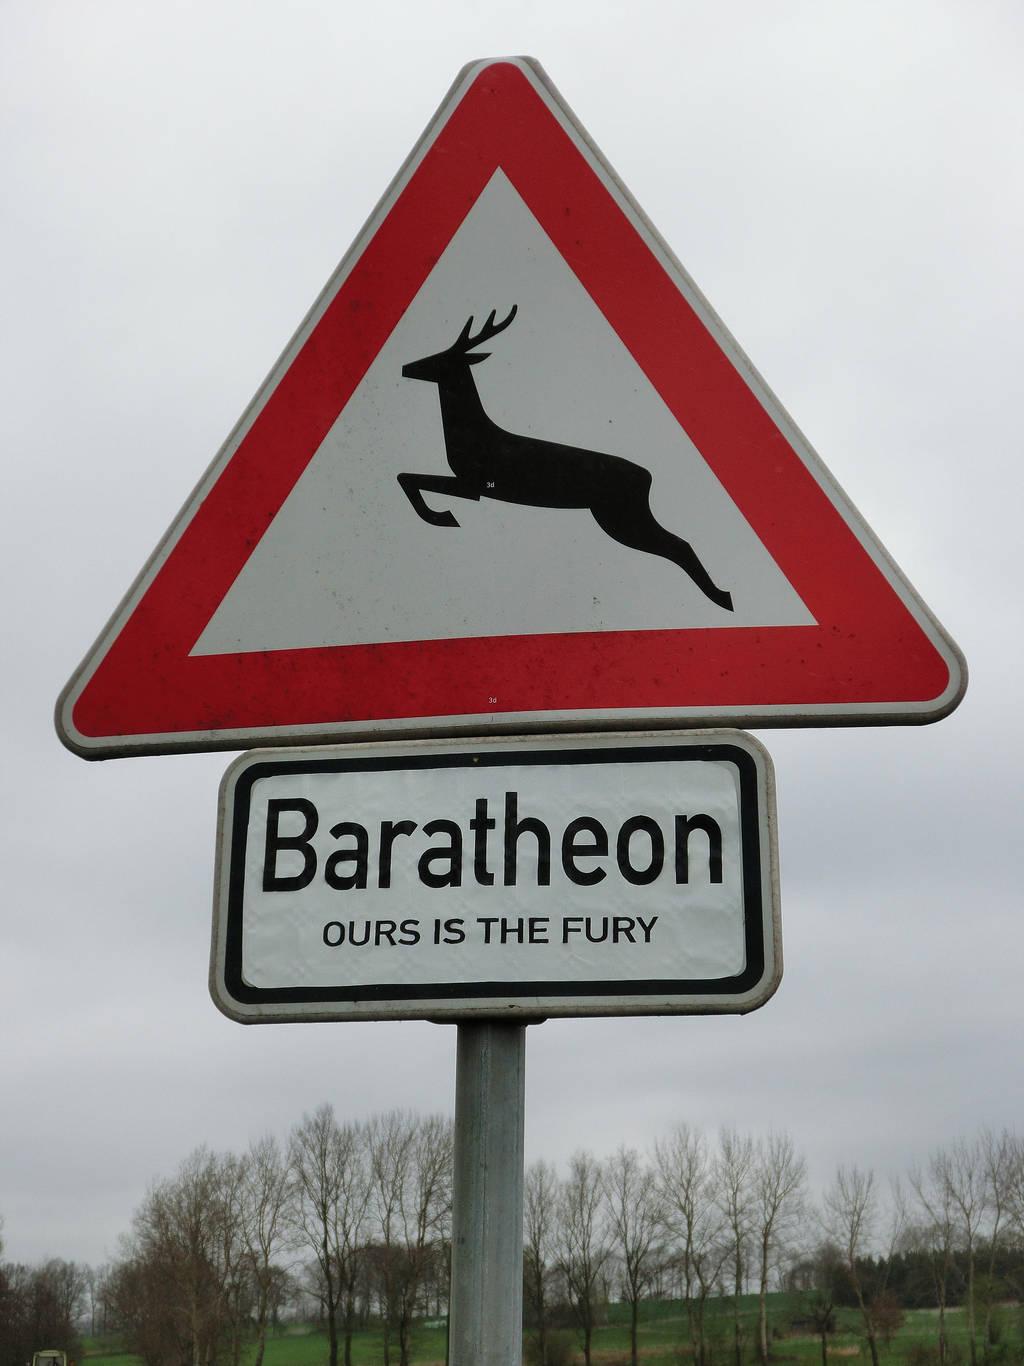 Baratheon by sykonurse